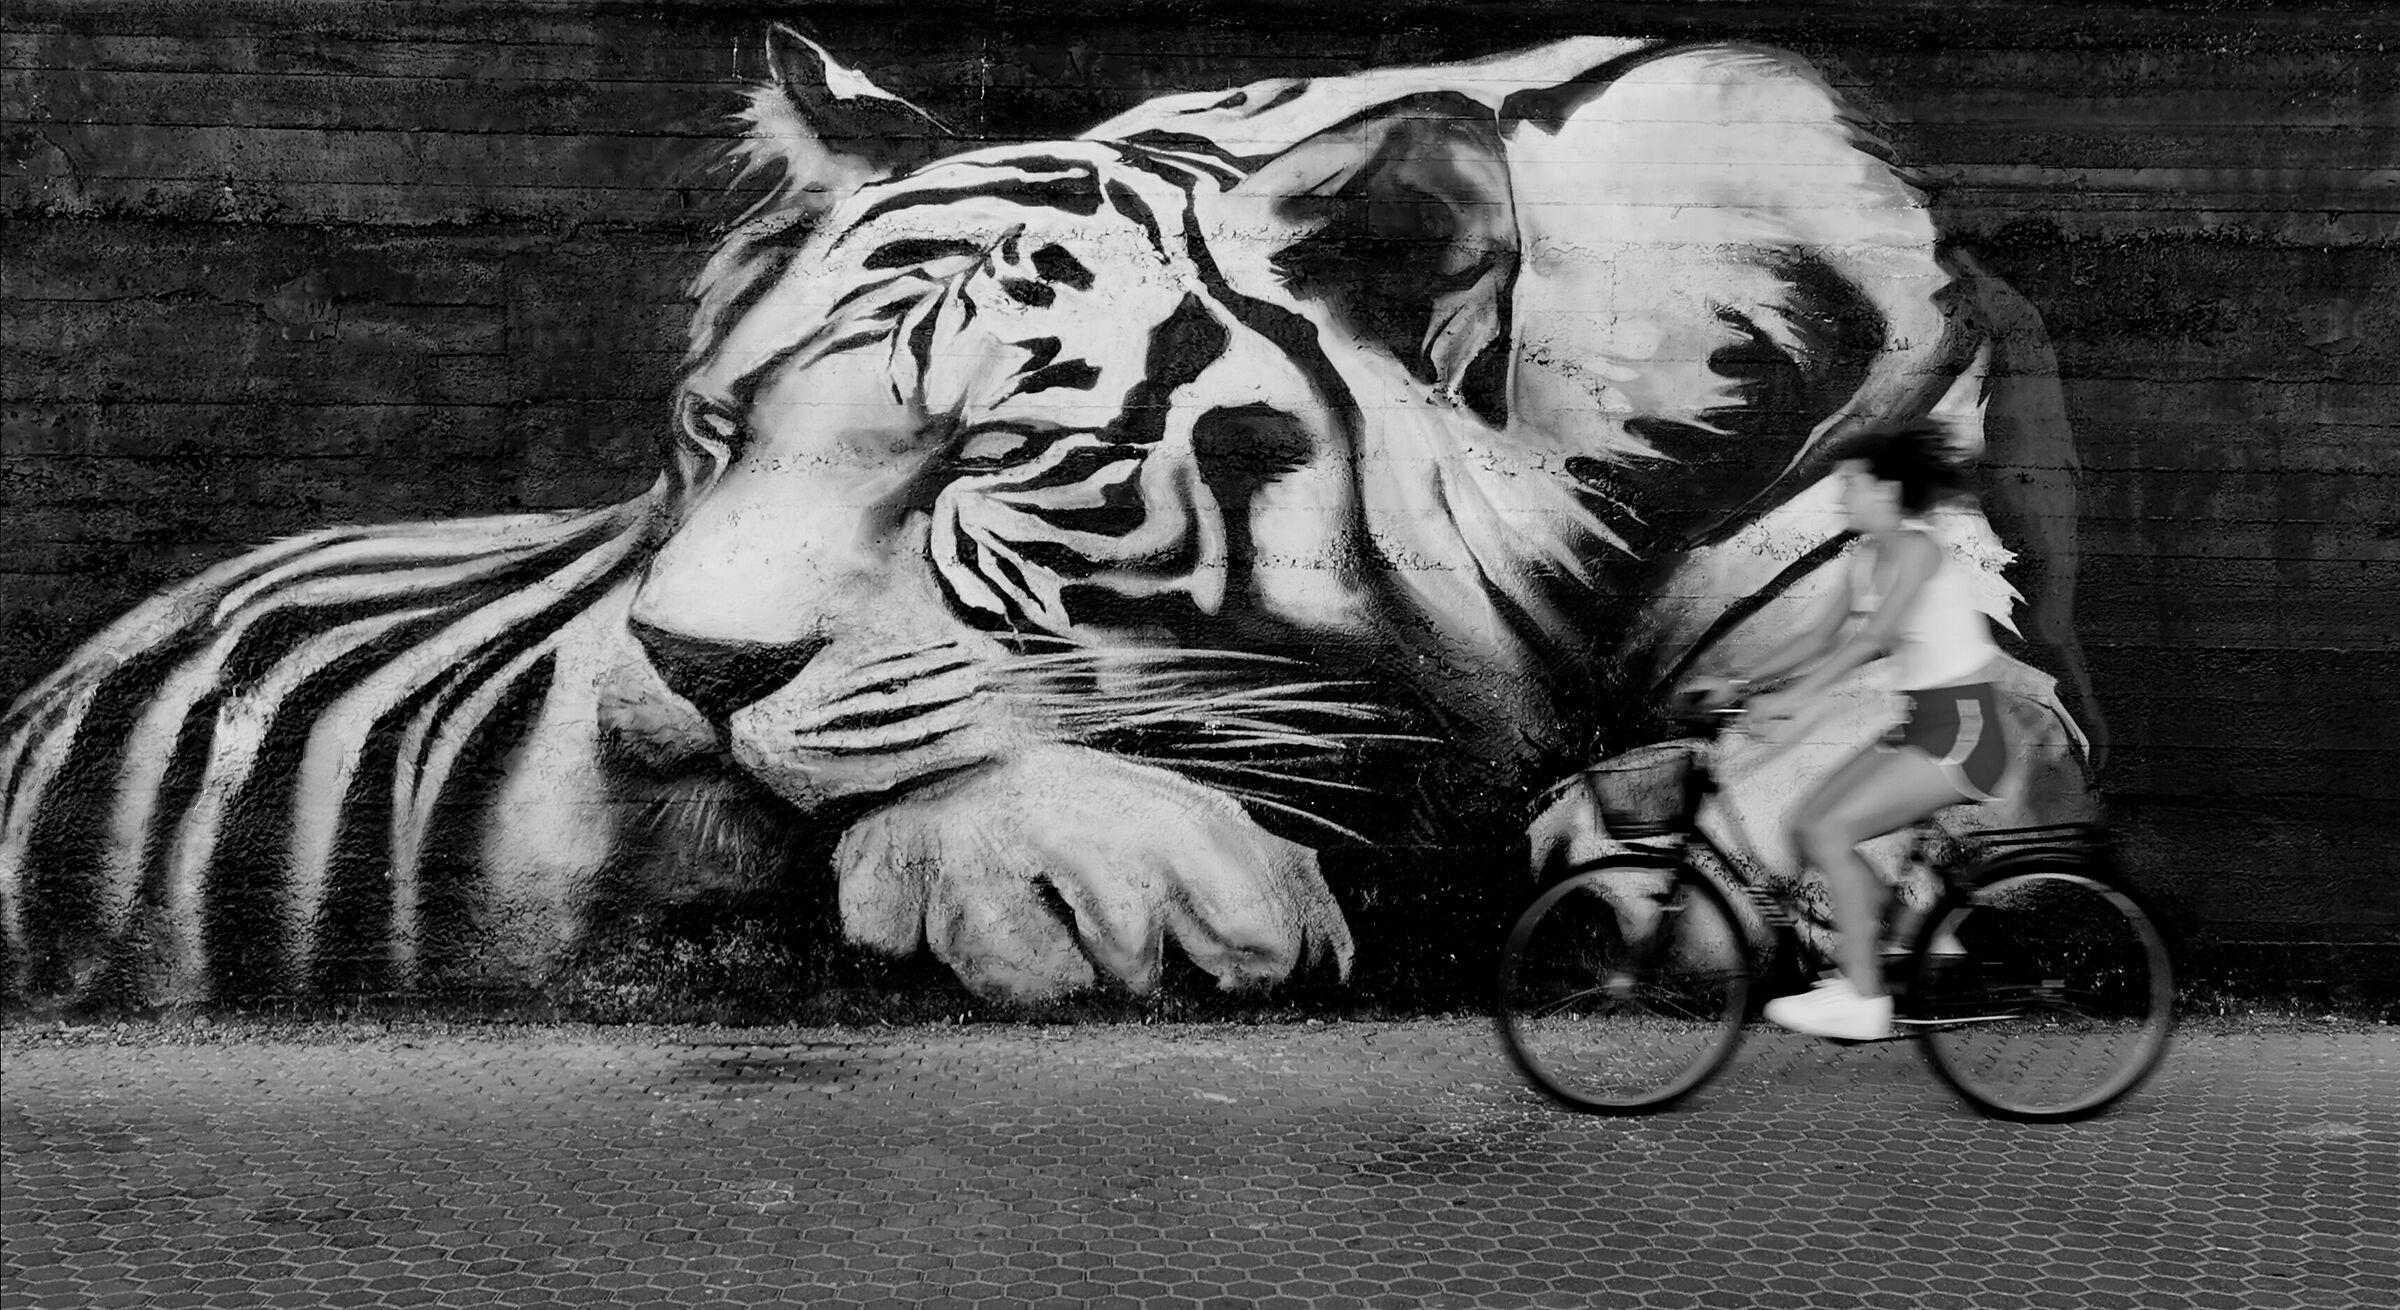 The awakening of the tiger ......